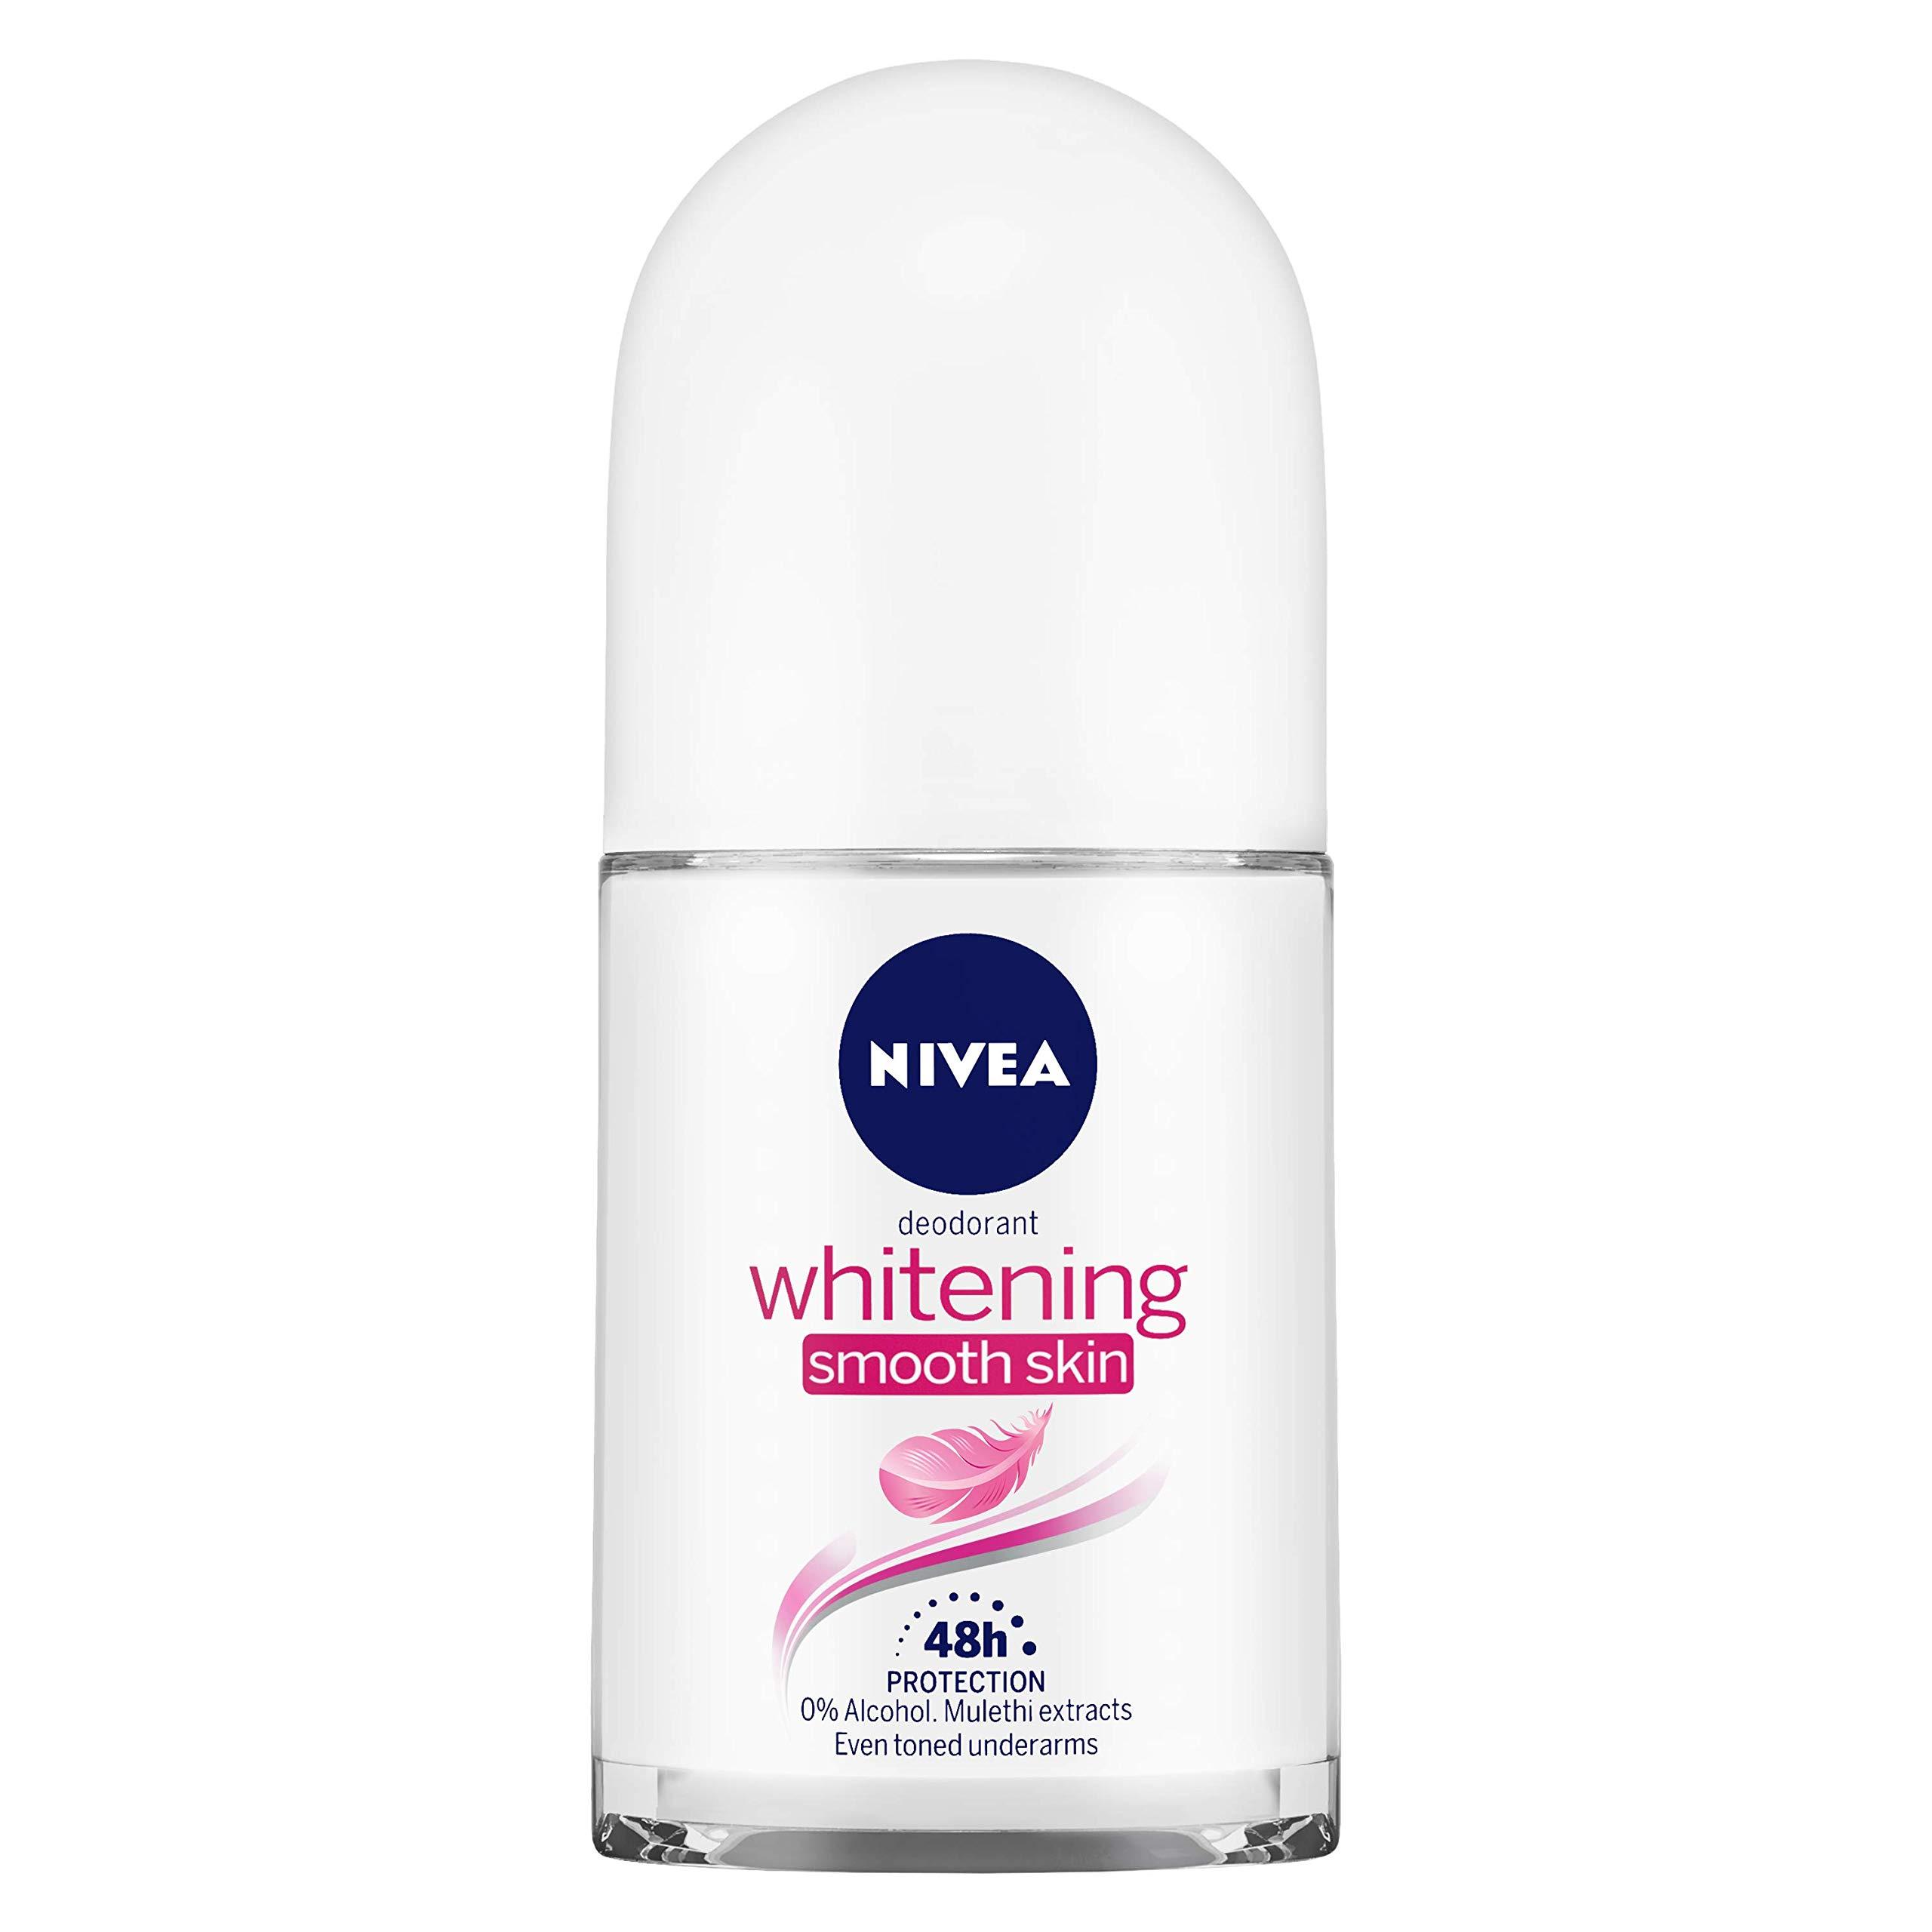 NIVEA Deodorant Roll-on, Whitening Smooth Skin, 50ml product image